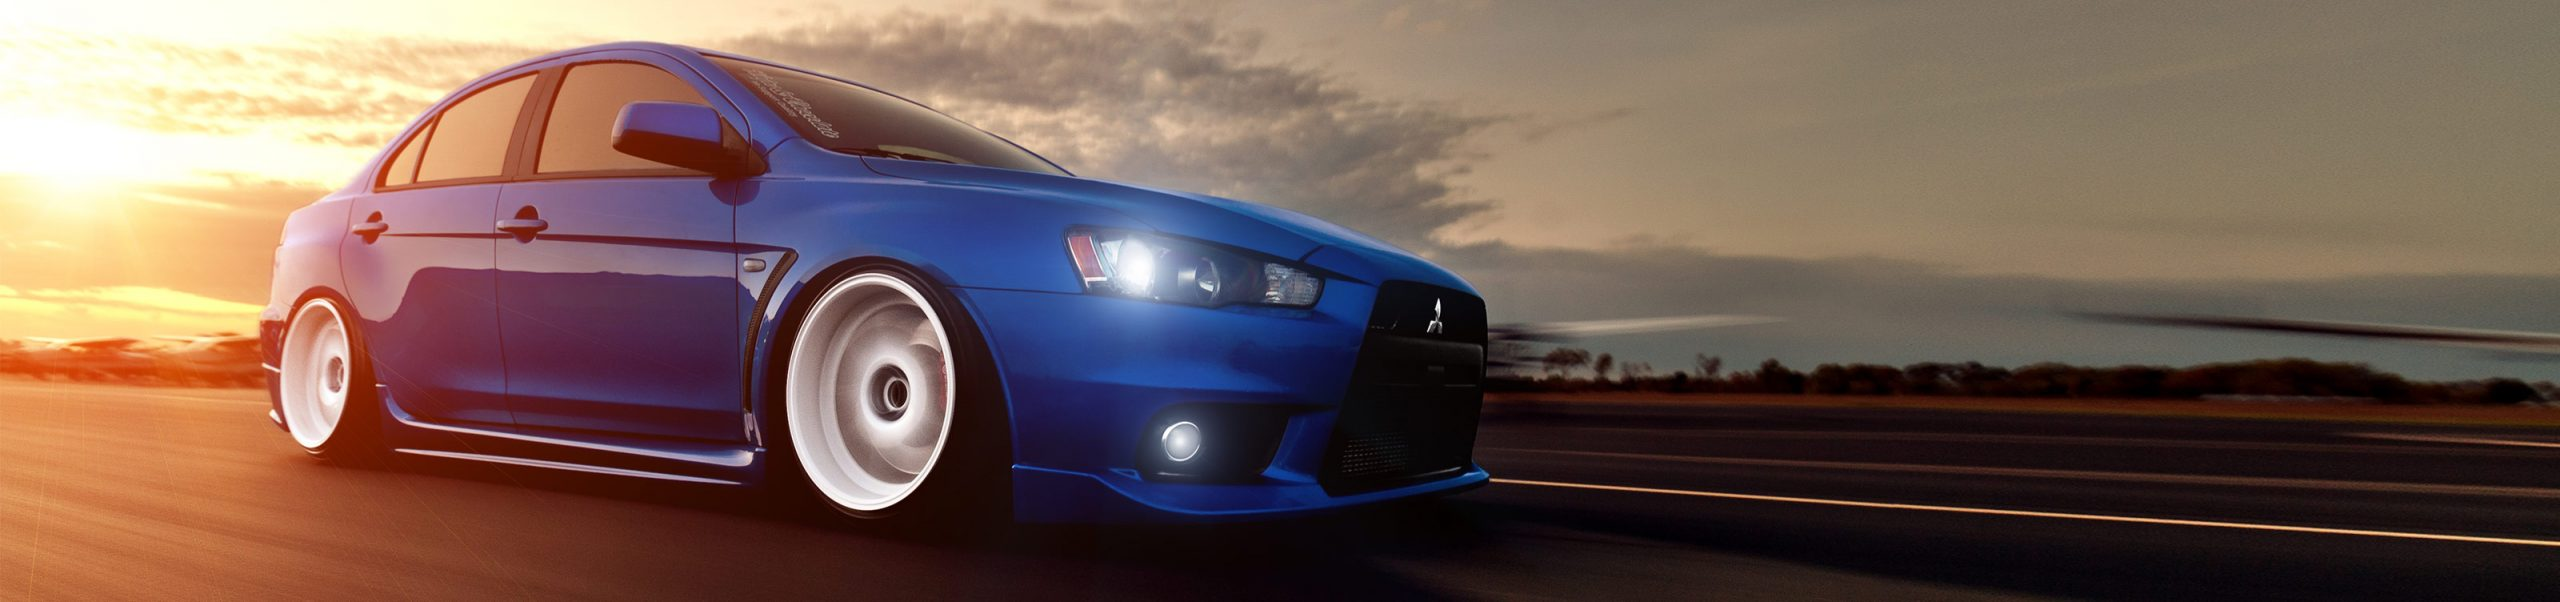 Mitsubishi Tuning & Aftermarket Performance Parts